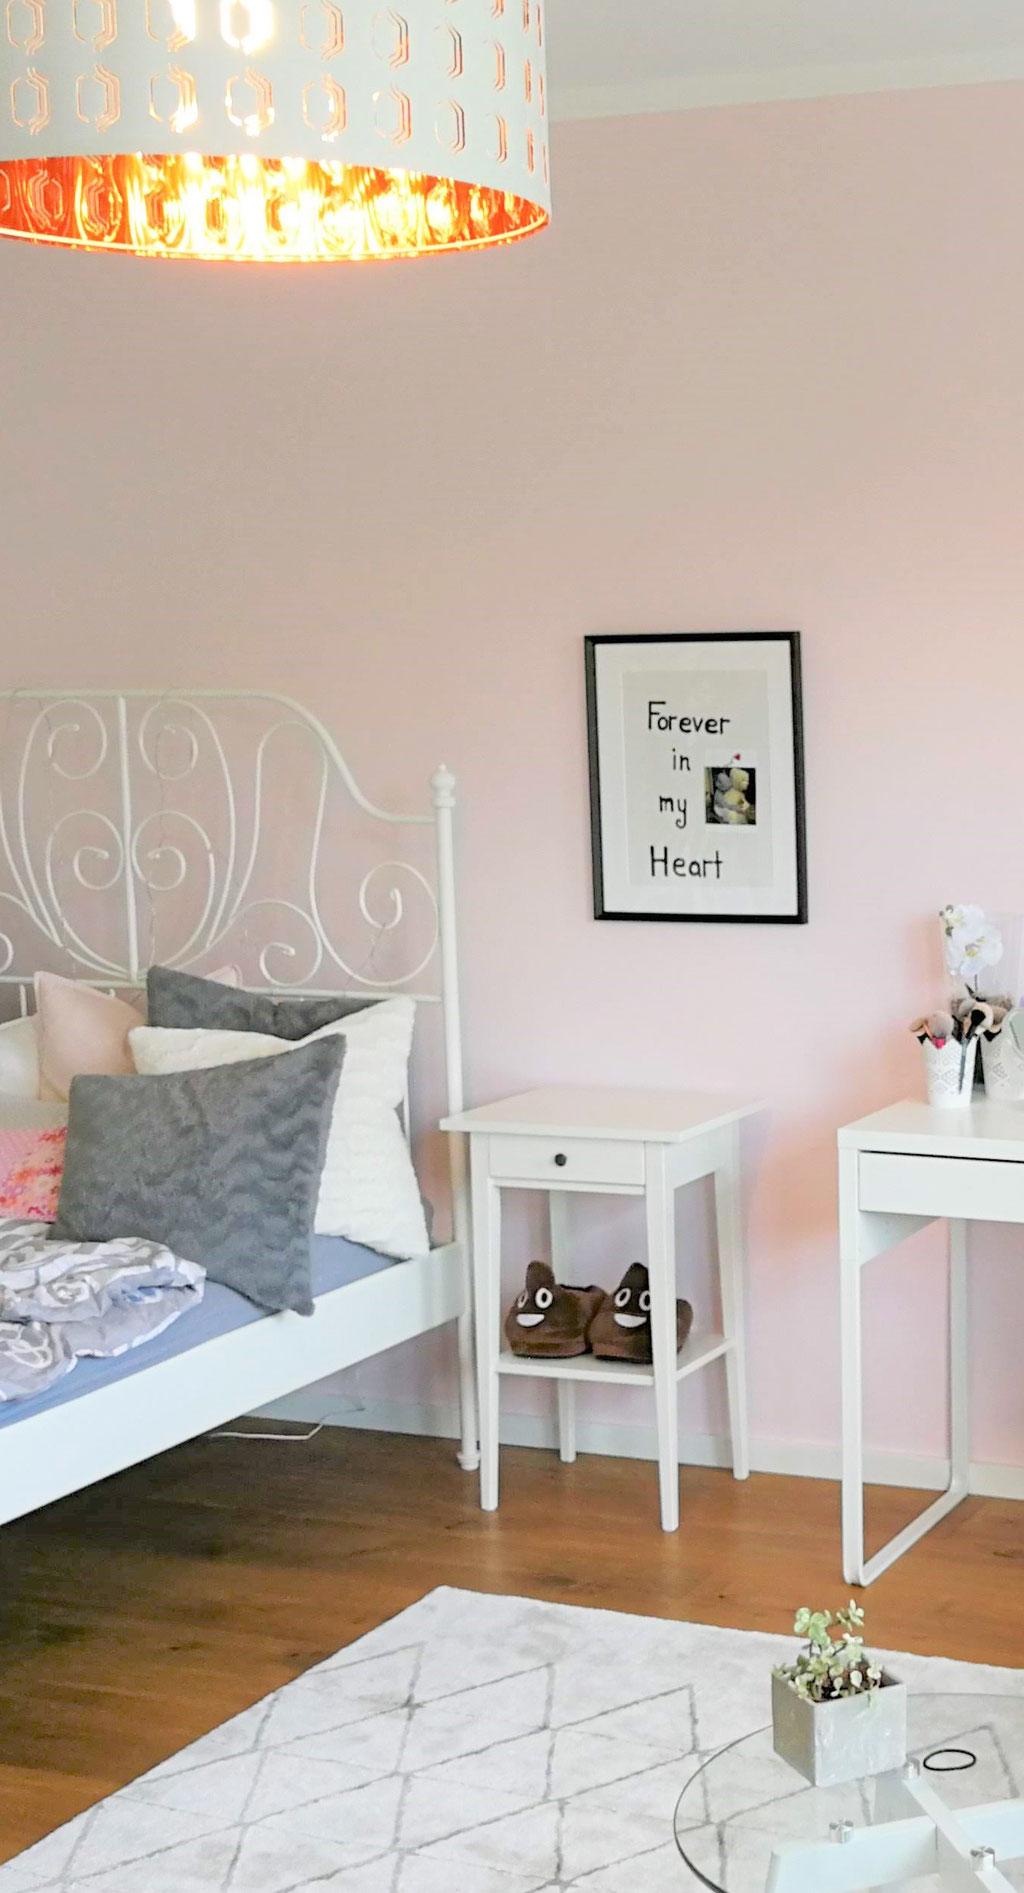 Neugestaltung eines Kinderzimmers, Rolf Kullmann Innenarchitekt, Atelier Feynsinn Köln